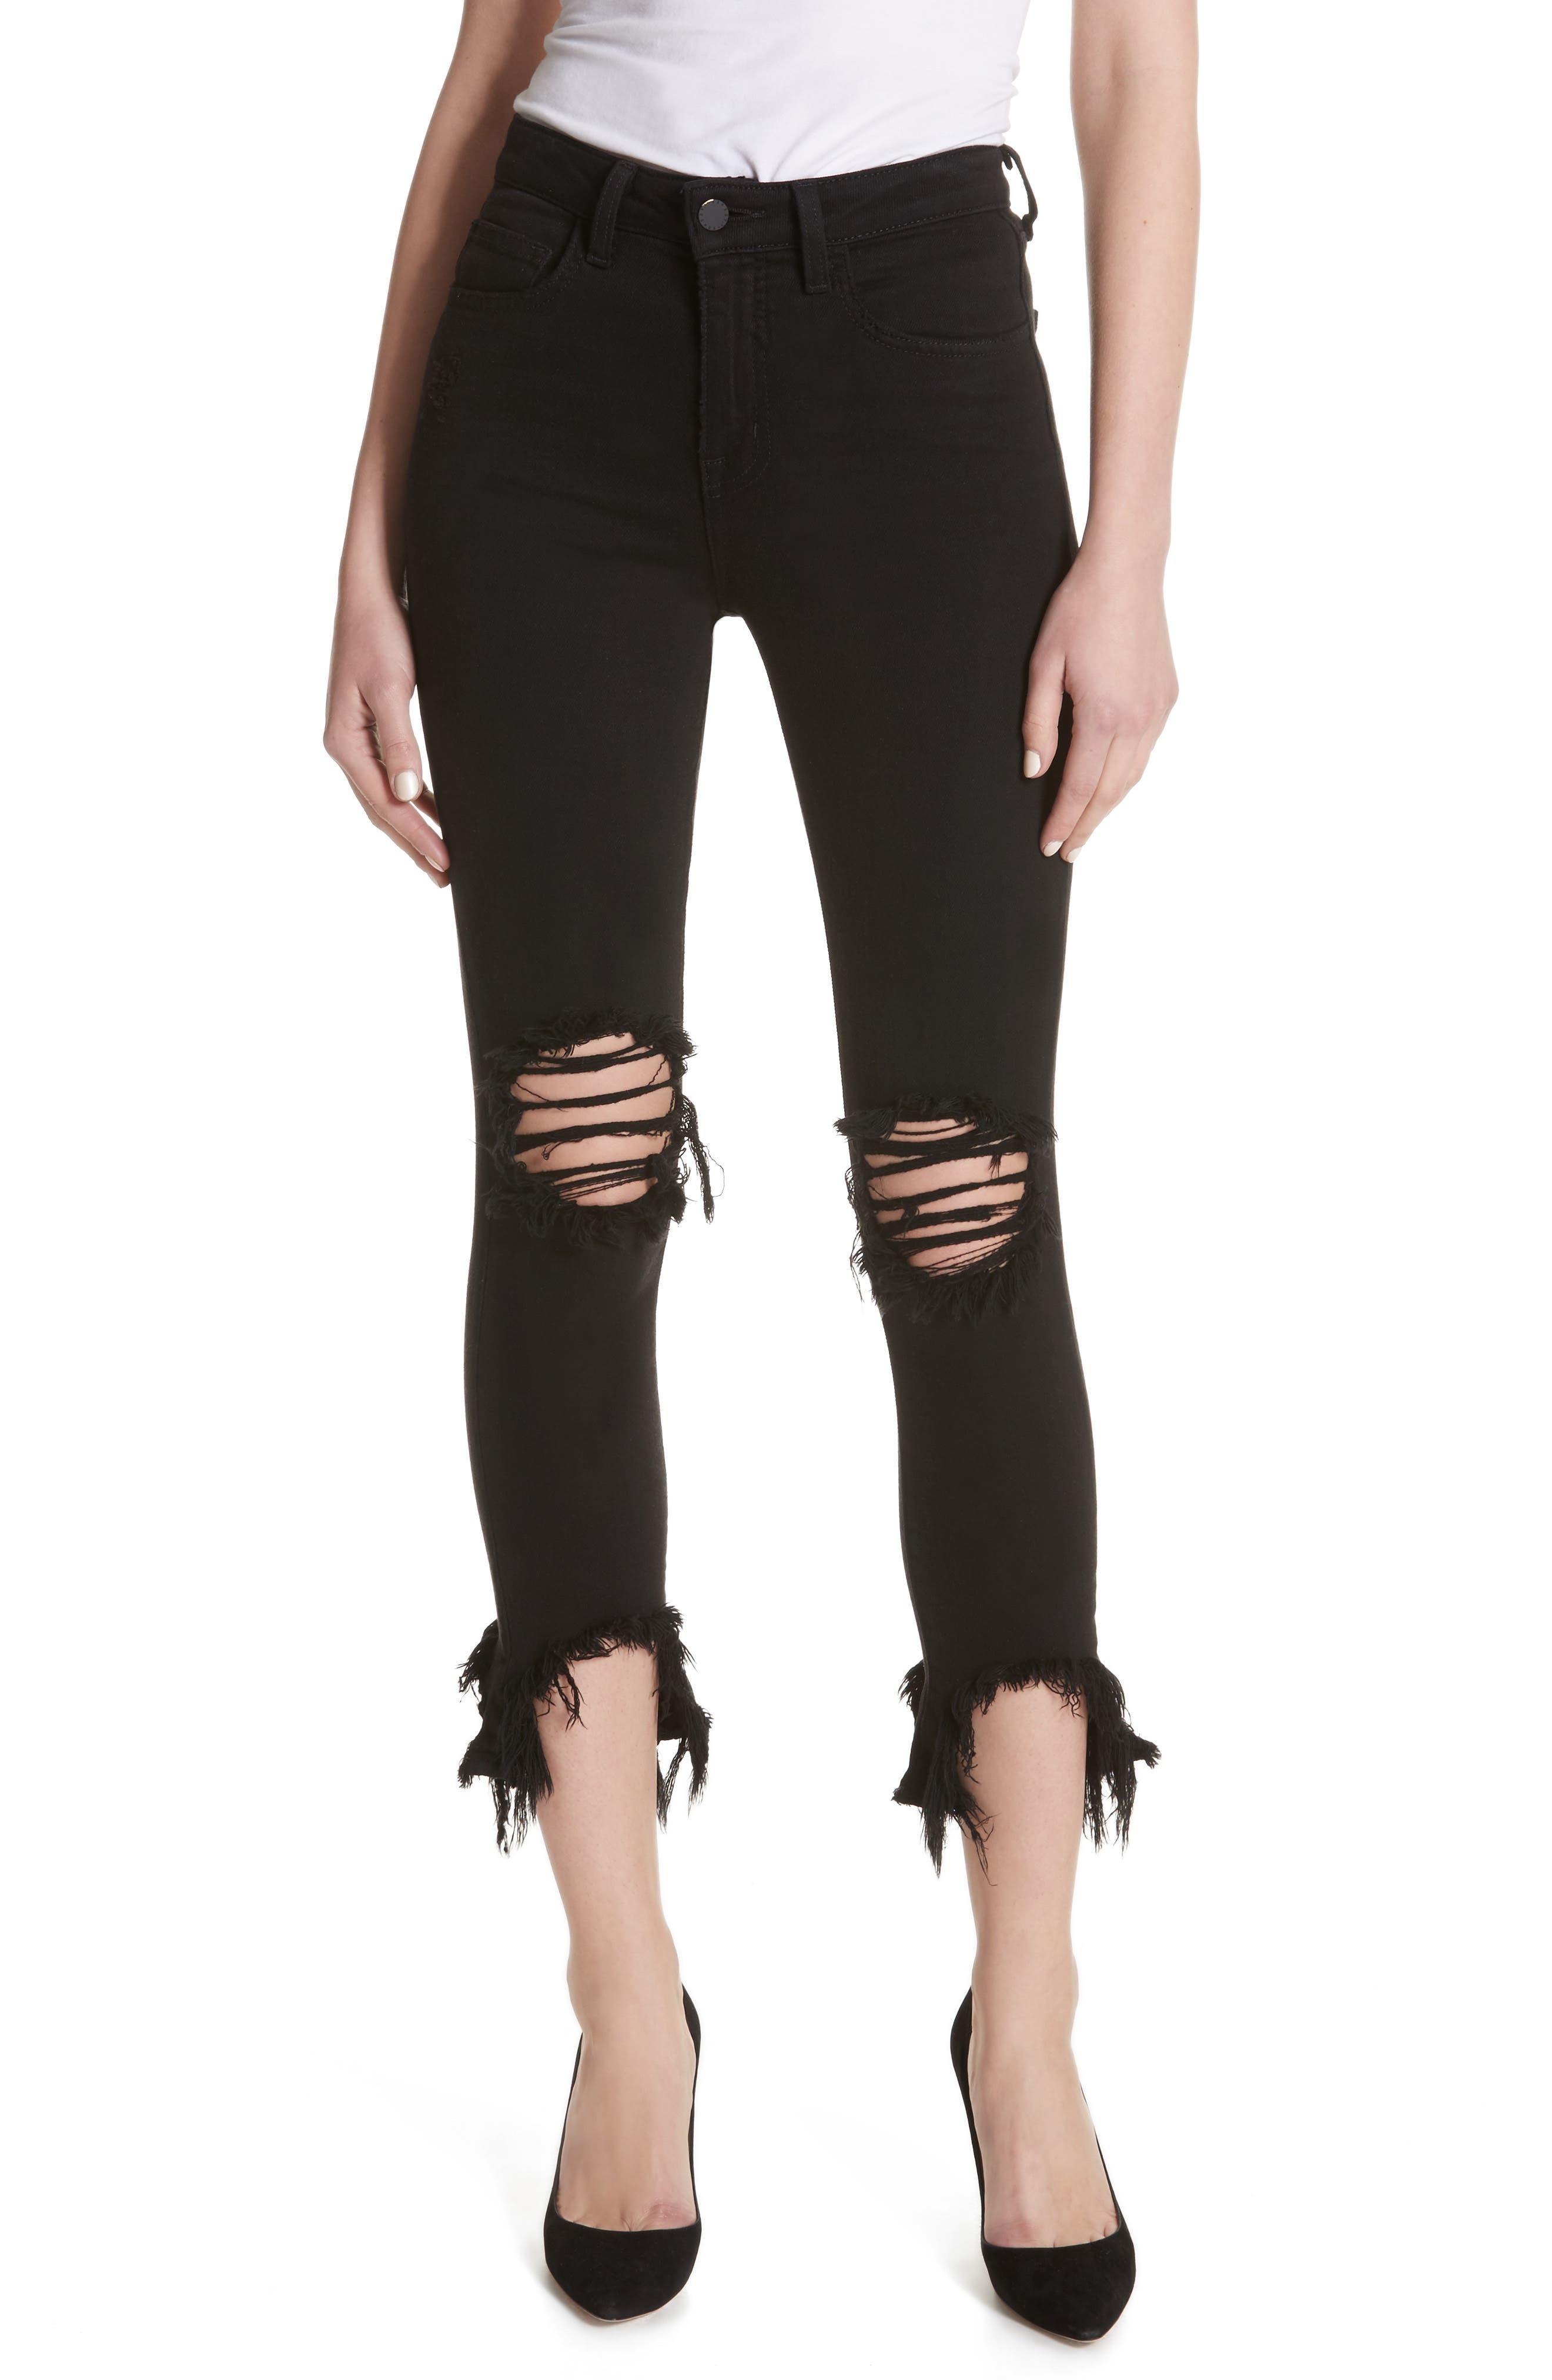 L'AGENCE, Highline High Waist Fray Hem Skinny Jeans, Main thumbnail 1, color, SATURATED BLACK DESTRUCT